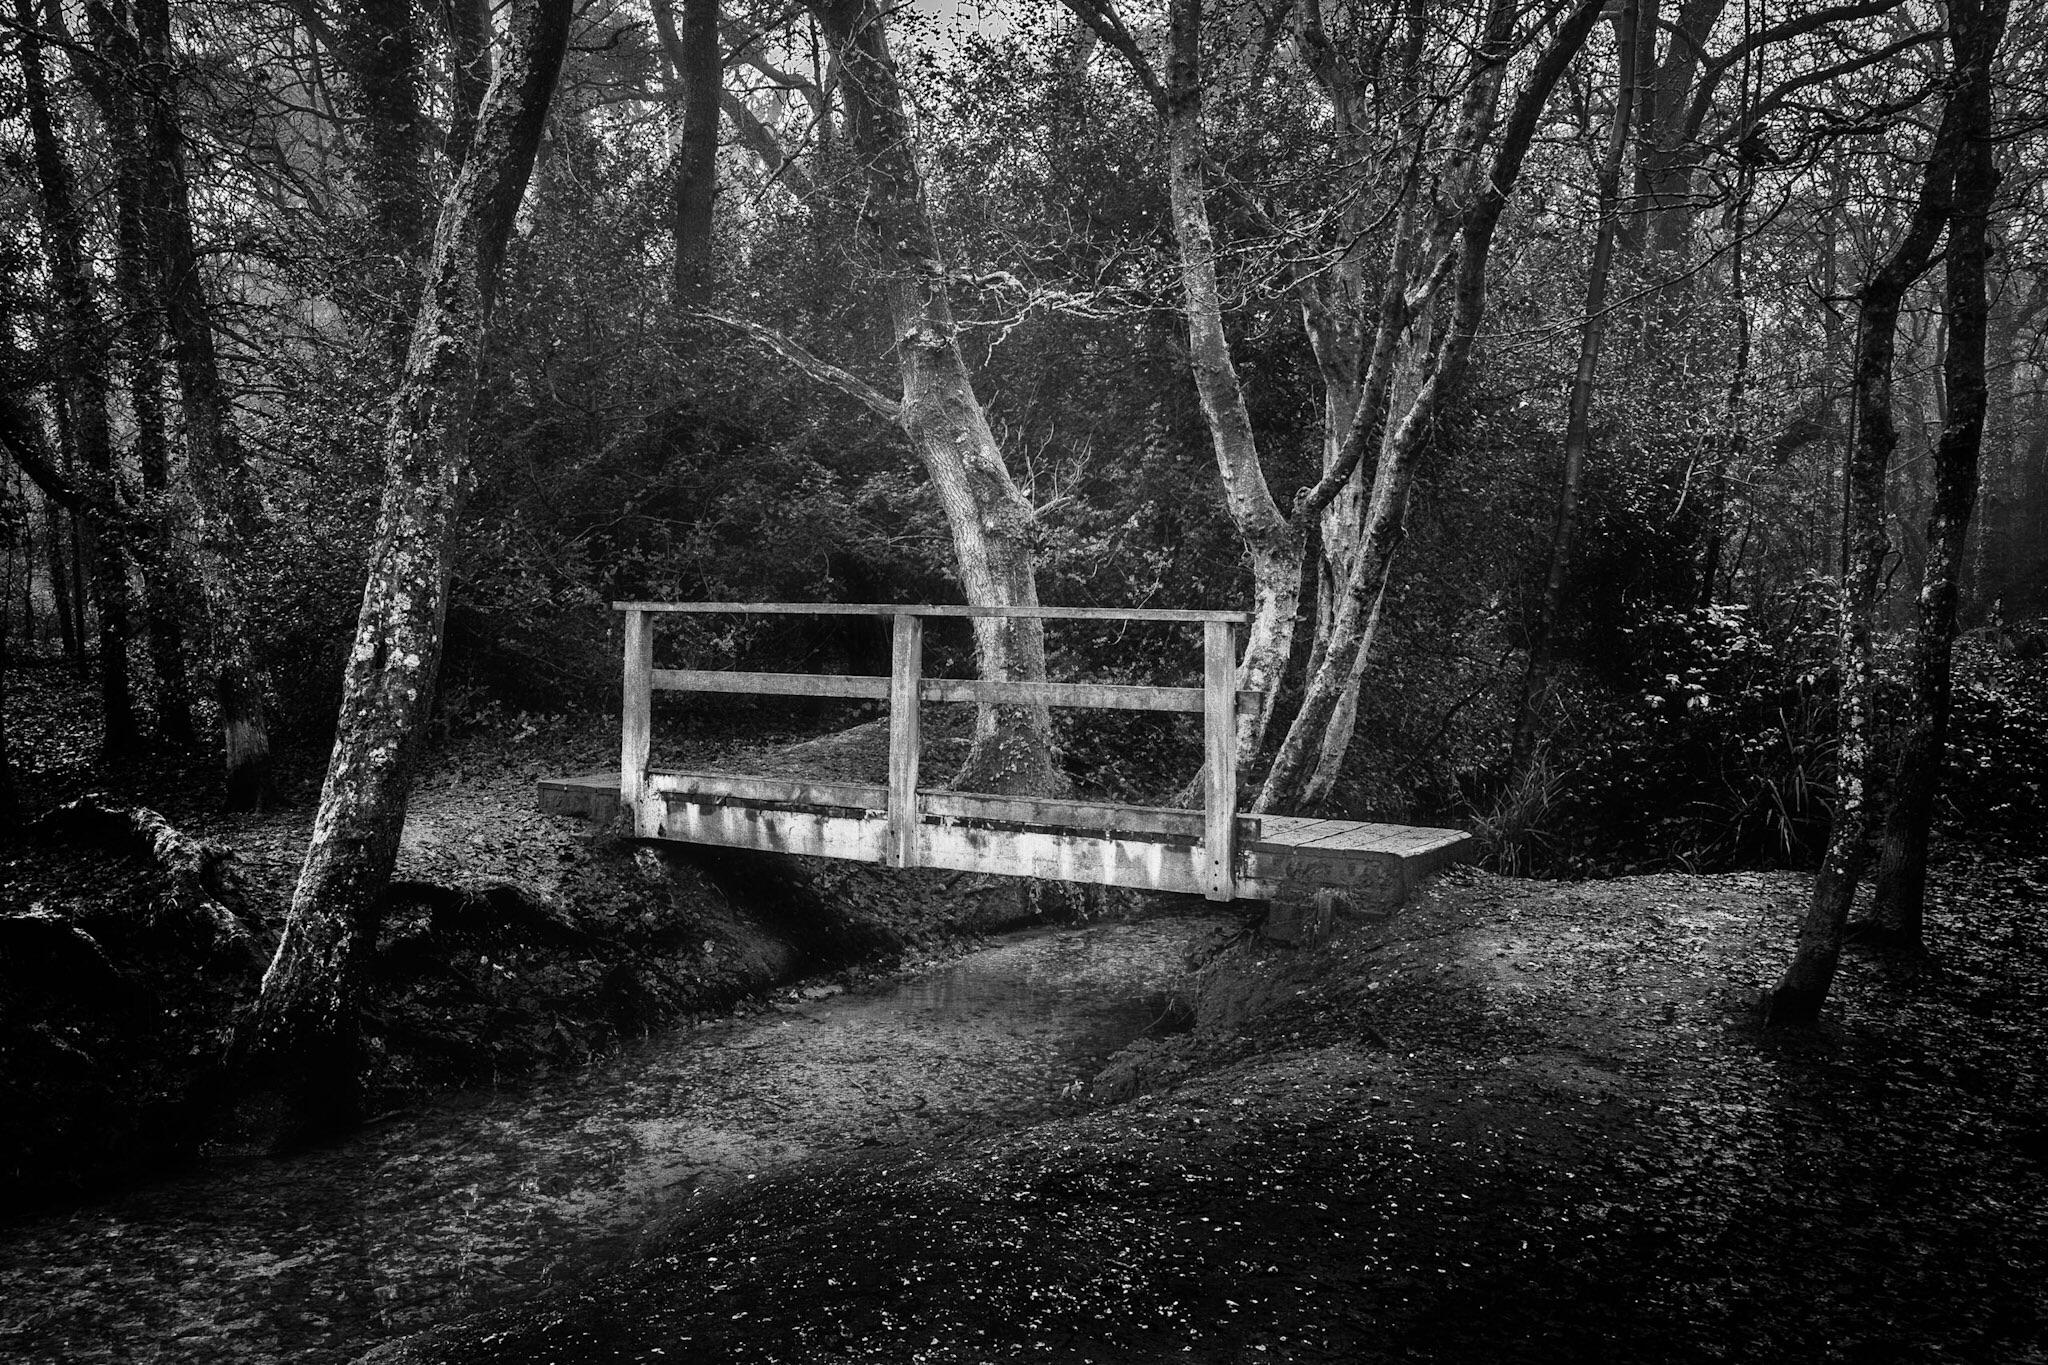 The footbridge in the woods. Delph Woods. Poole. Dorset.